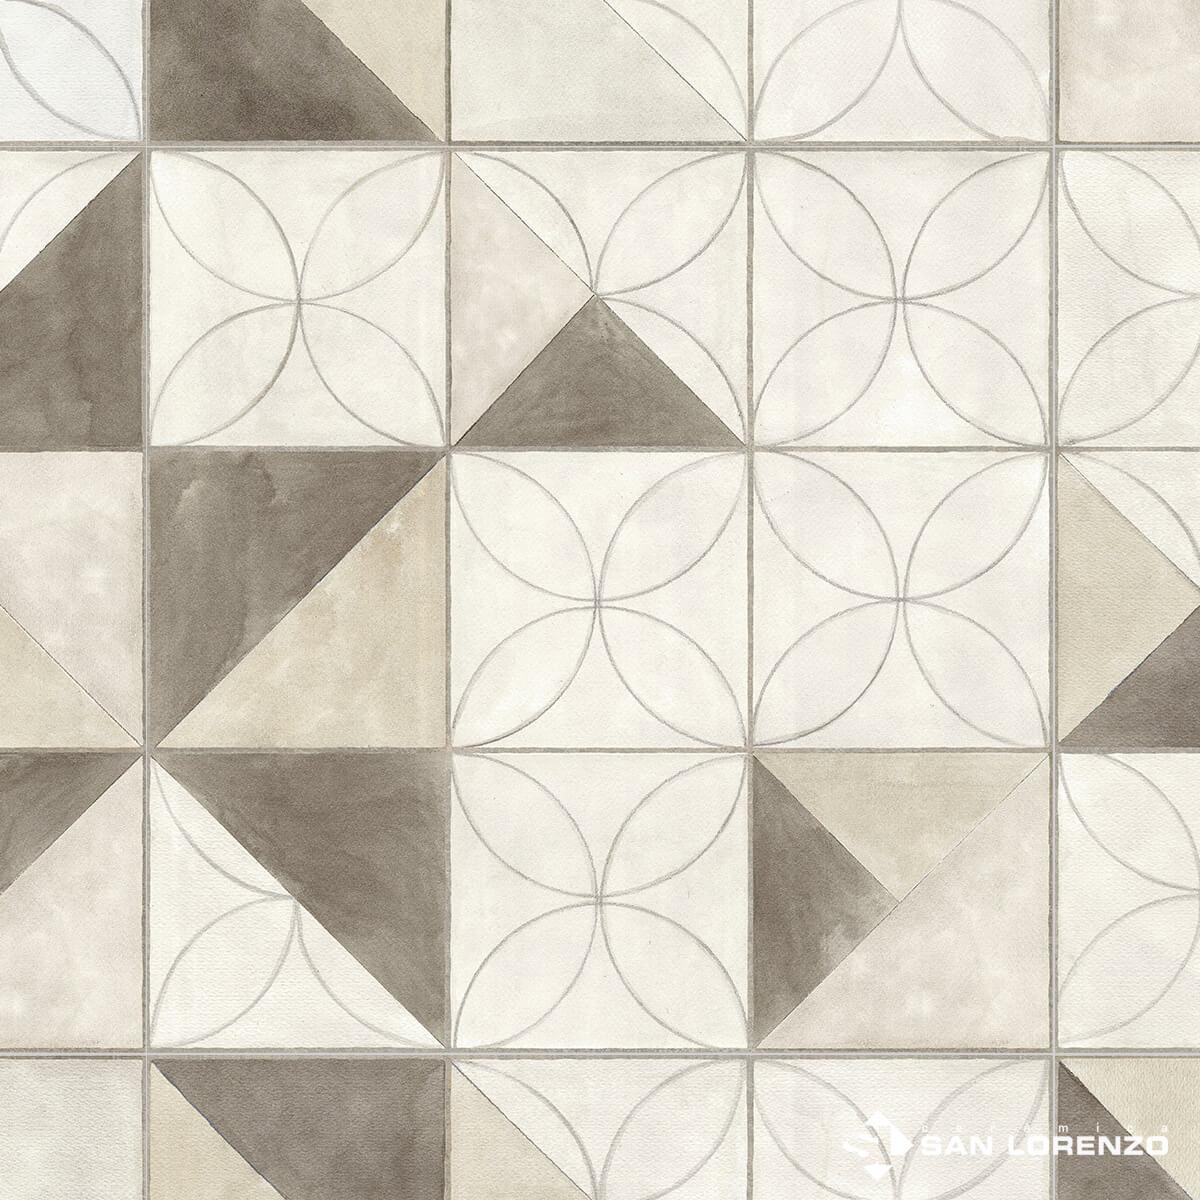 Ceramico San Lorenzo Flower Overlap 45,3 X 45,3 Cj. 2,05 M2